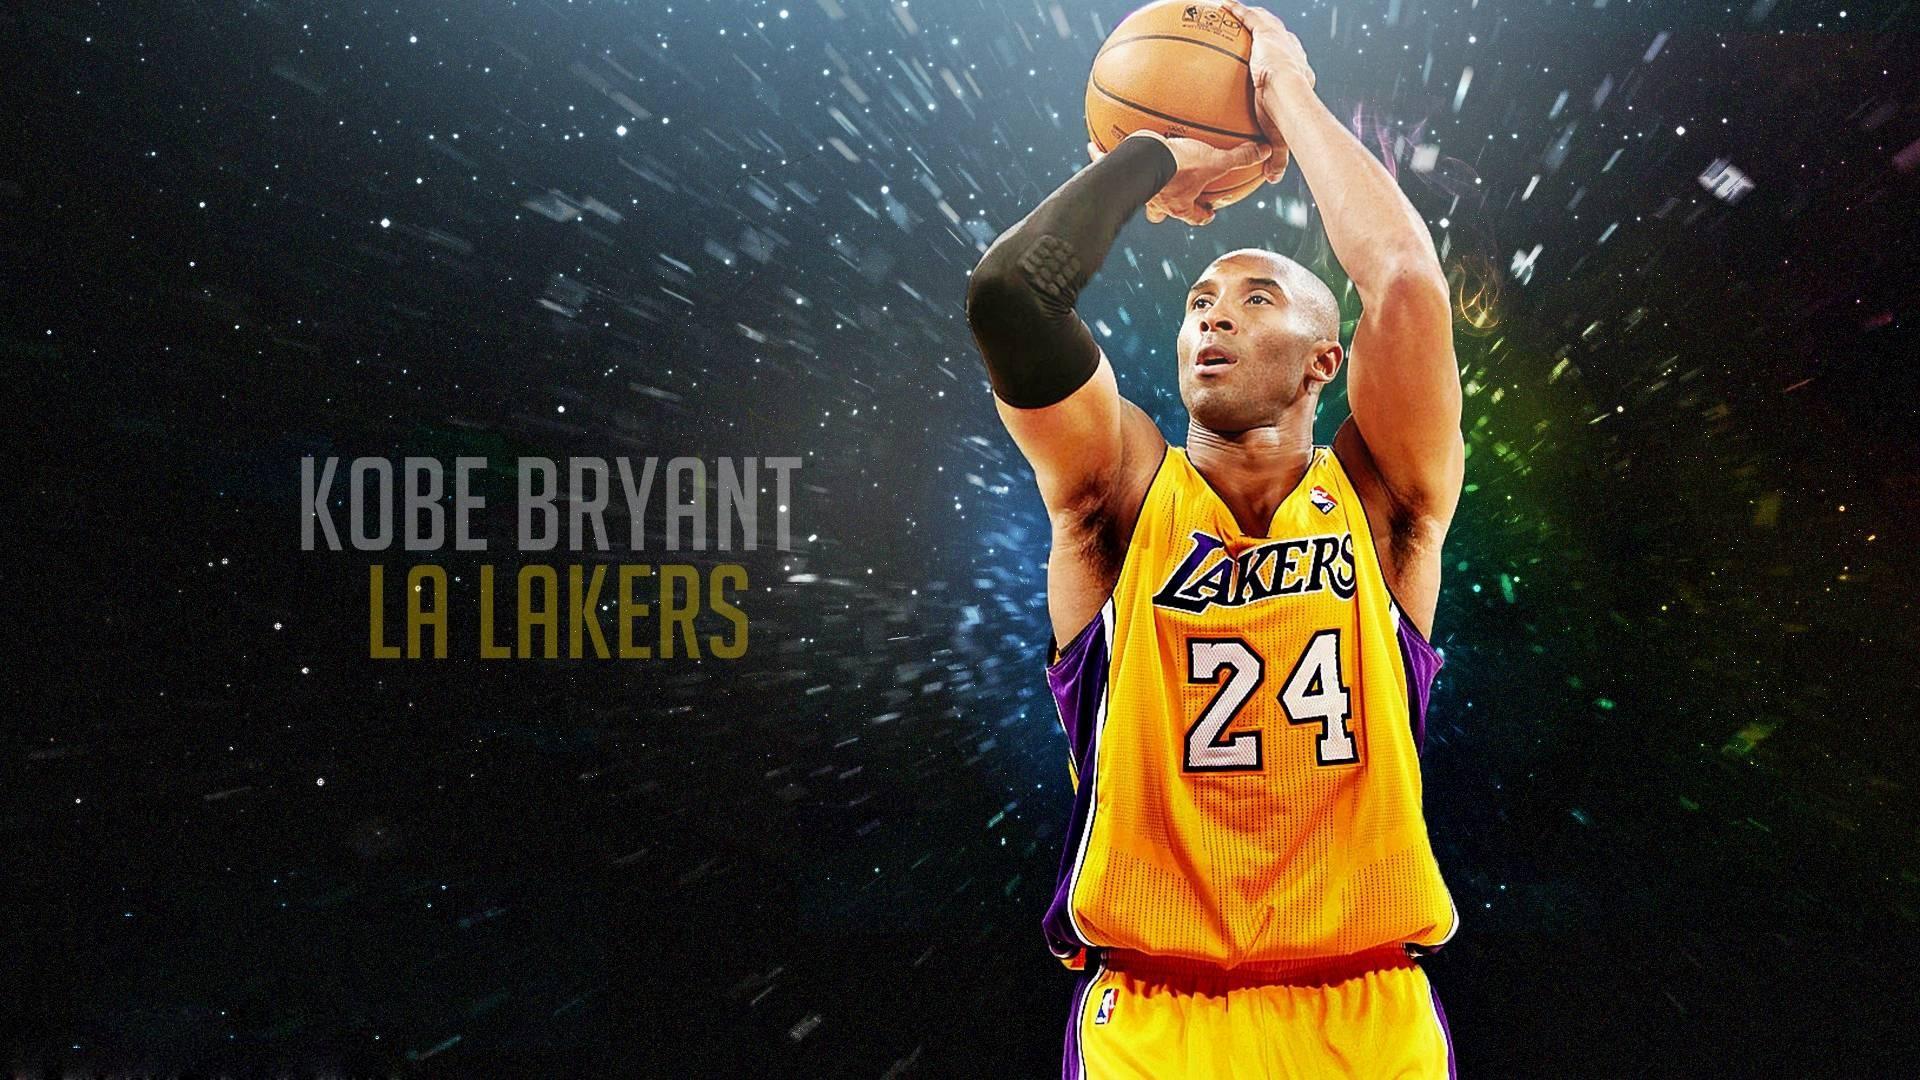 Free-Kobe-Bryant-Wallpaper-Basketball